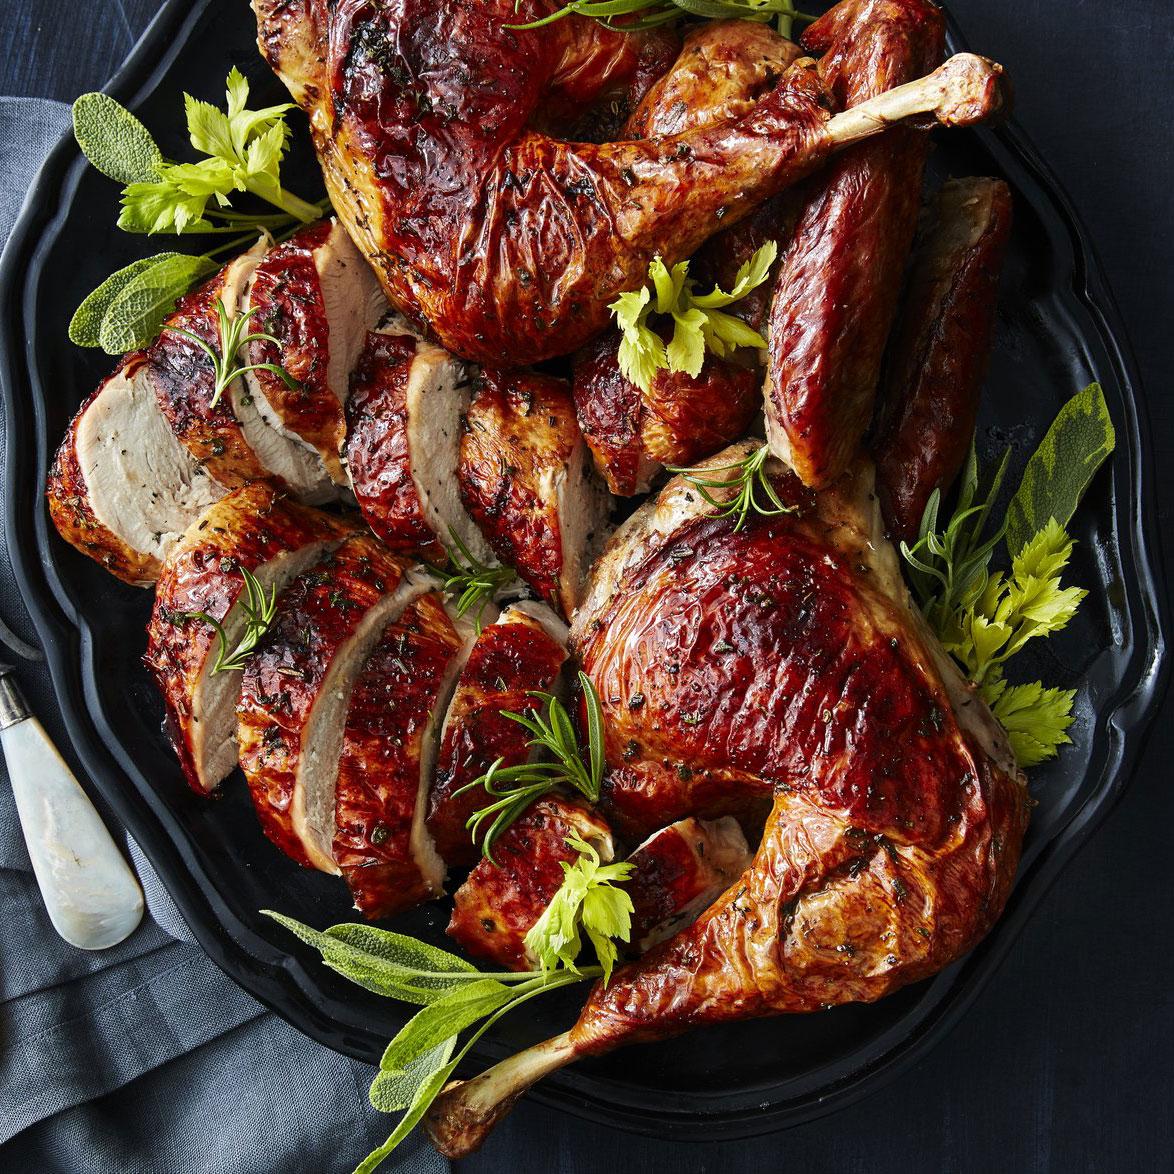 Grilled Butterflied Turkey with Celery Herb Rub